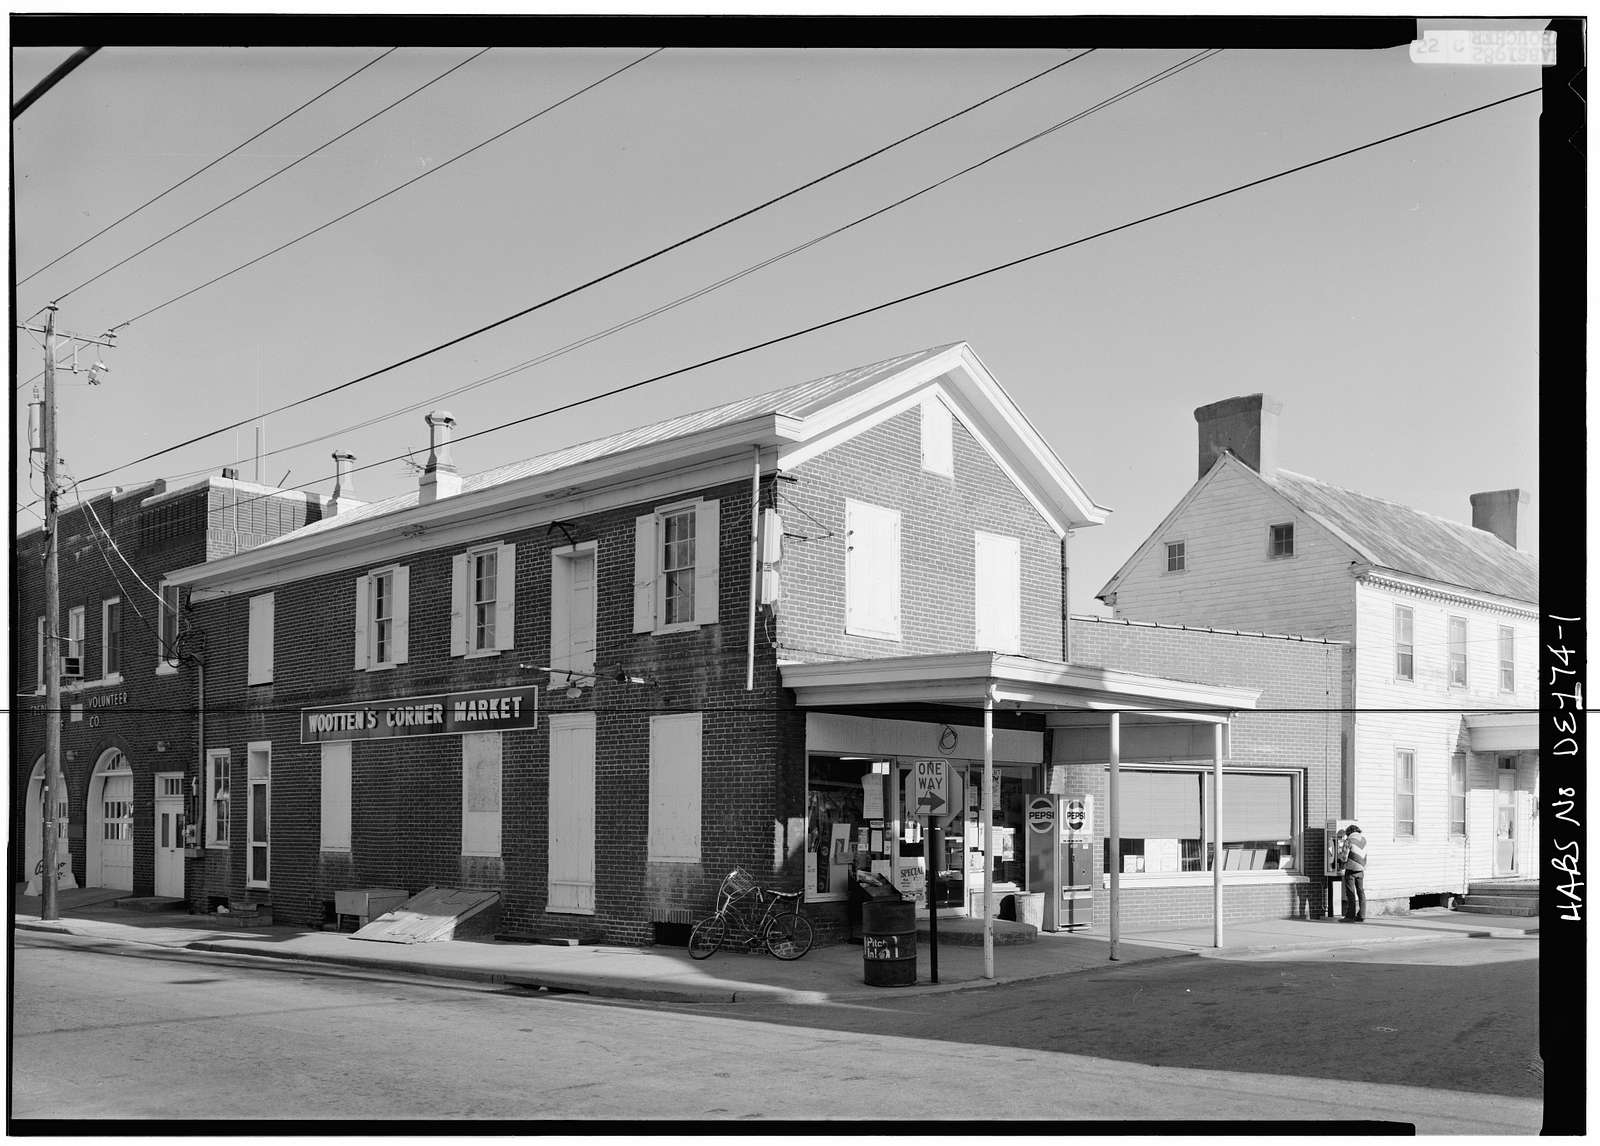 John Dill Store, 2 Market Street, Frederica, Kent County, DE